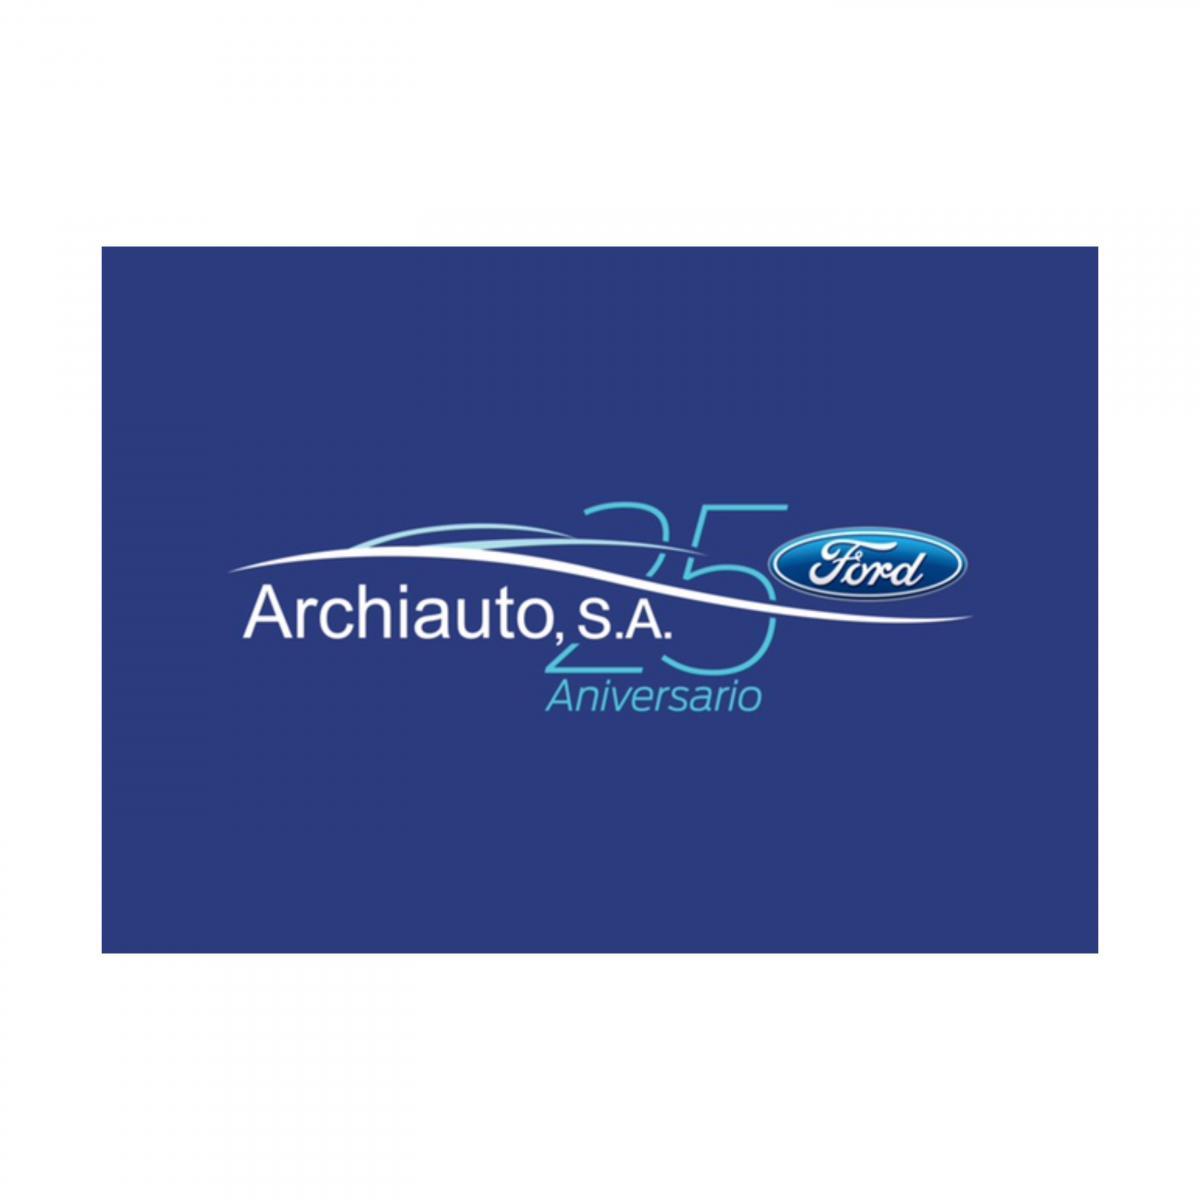 00 Logo cuadrado Archiauto-Ford